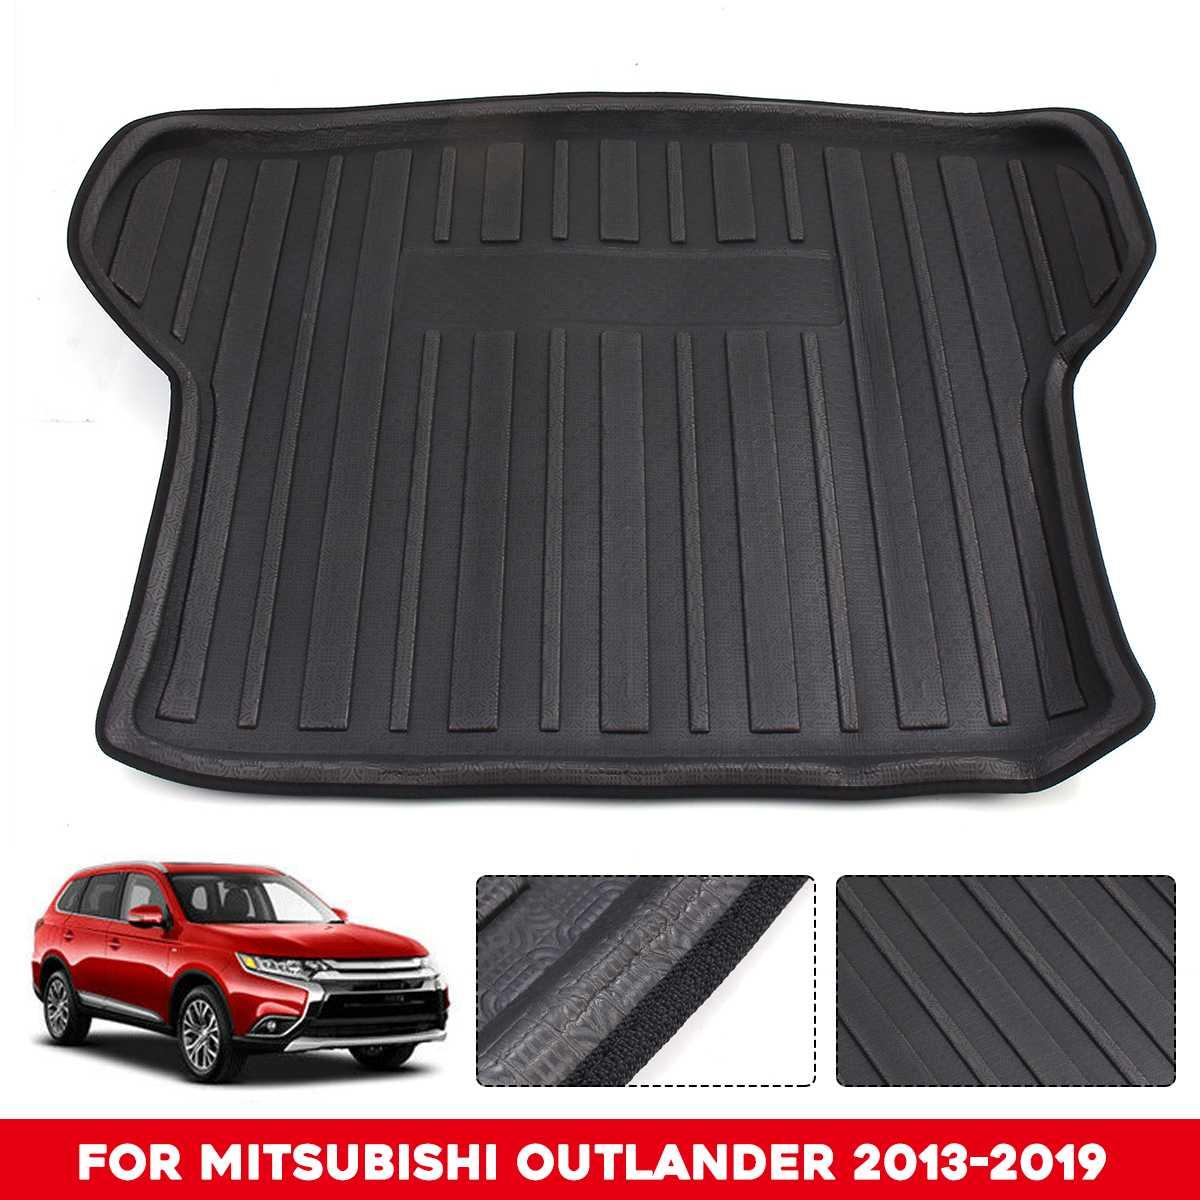 Audew Rear Trunk Cargo Floor Mat For Mitsubishi Outlander 2013-2019 Waterproof Anti-skid Shock-proof Buffer Performance